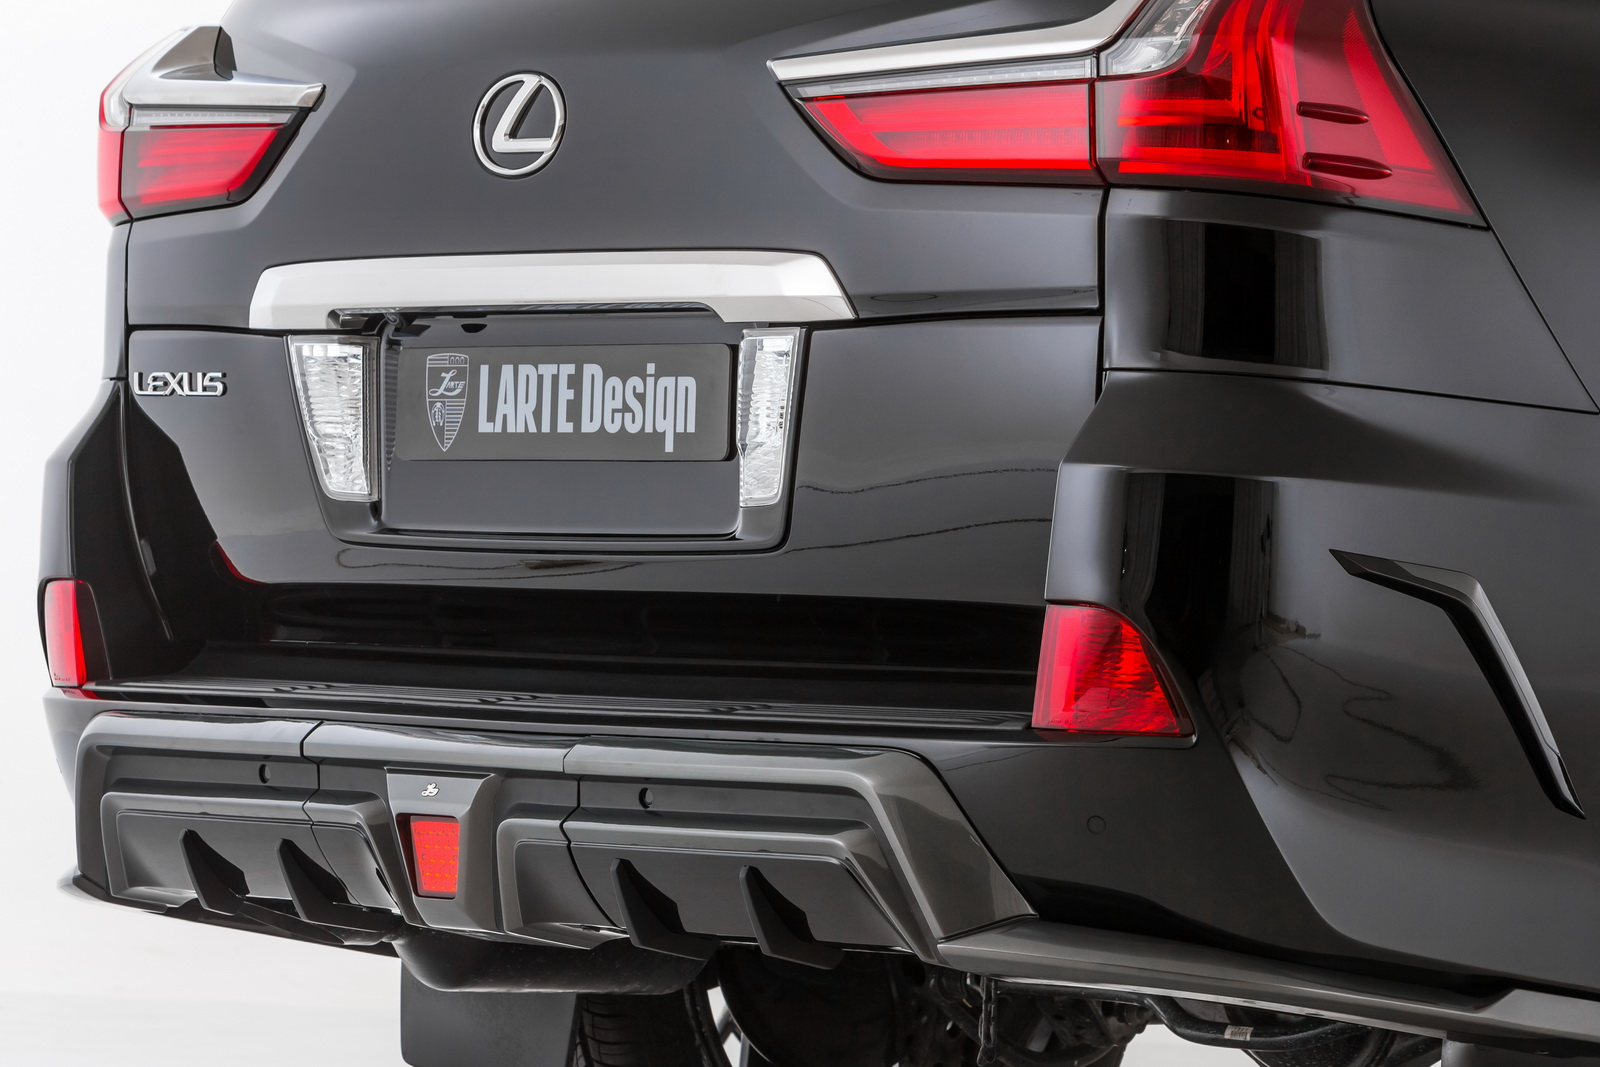 2016 Lexus LX 570 by Larte Design shown in the flesh Paul ...